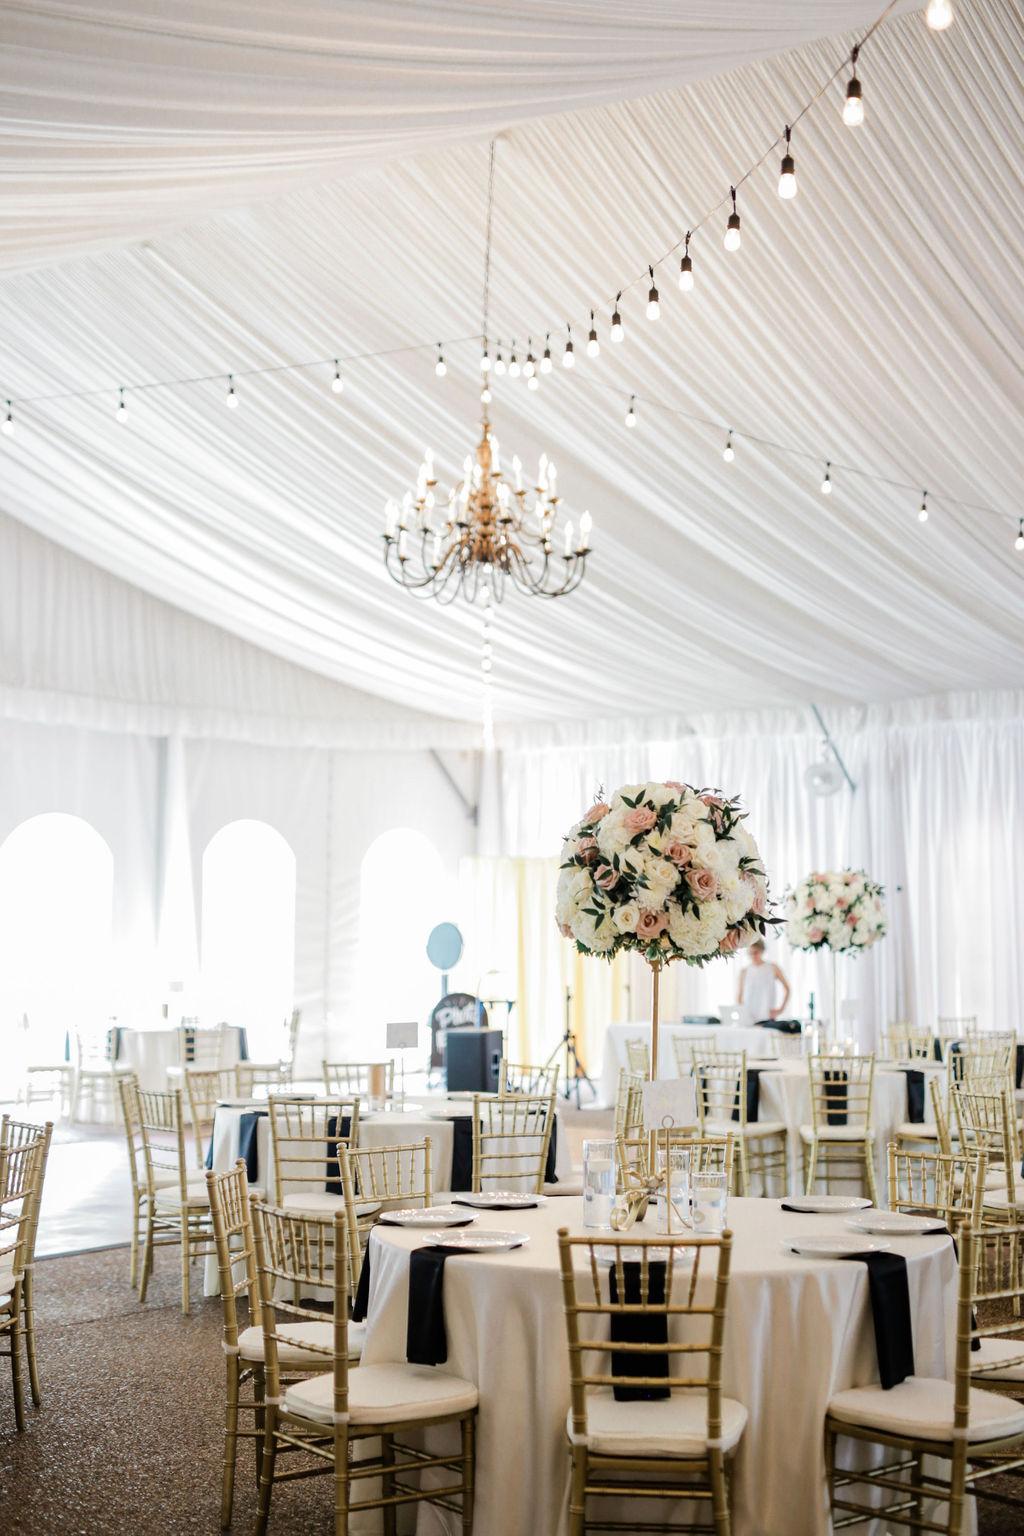 Wedding reception decor for Riverwood Mansion wedding featured on Nashville Bride Guide